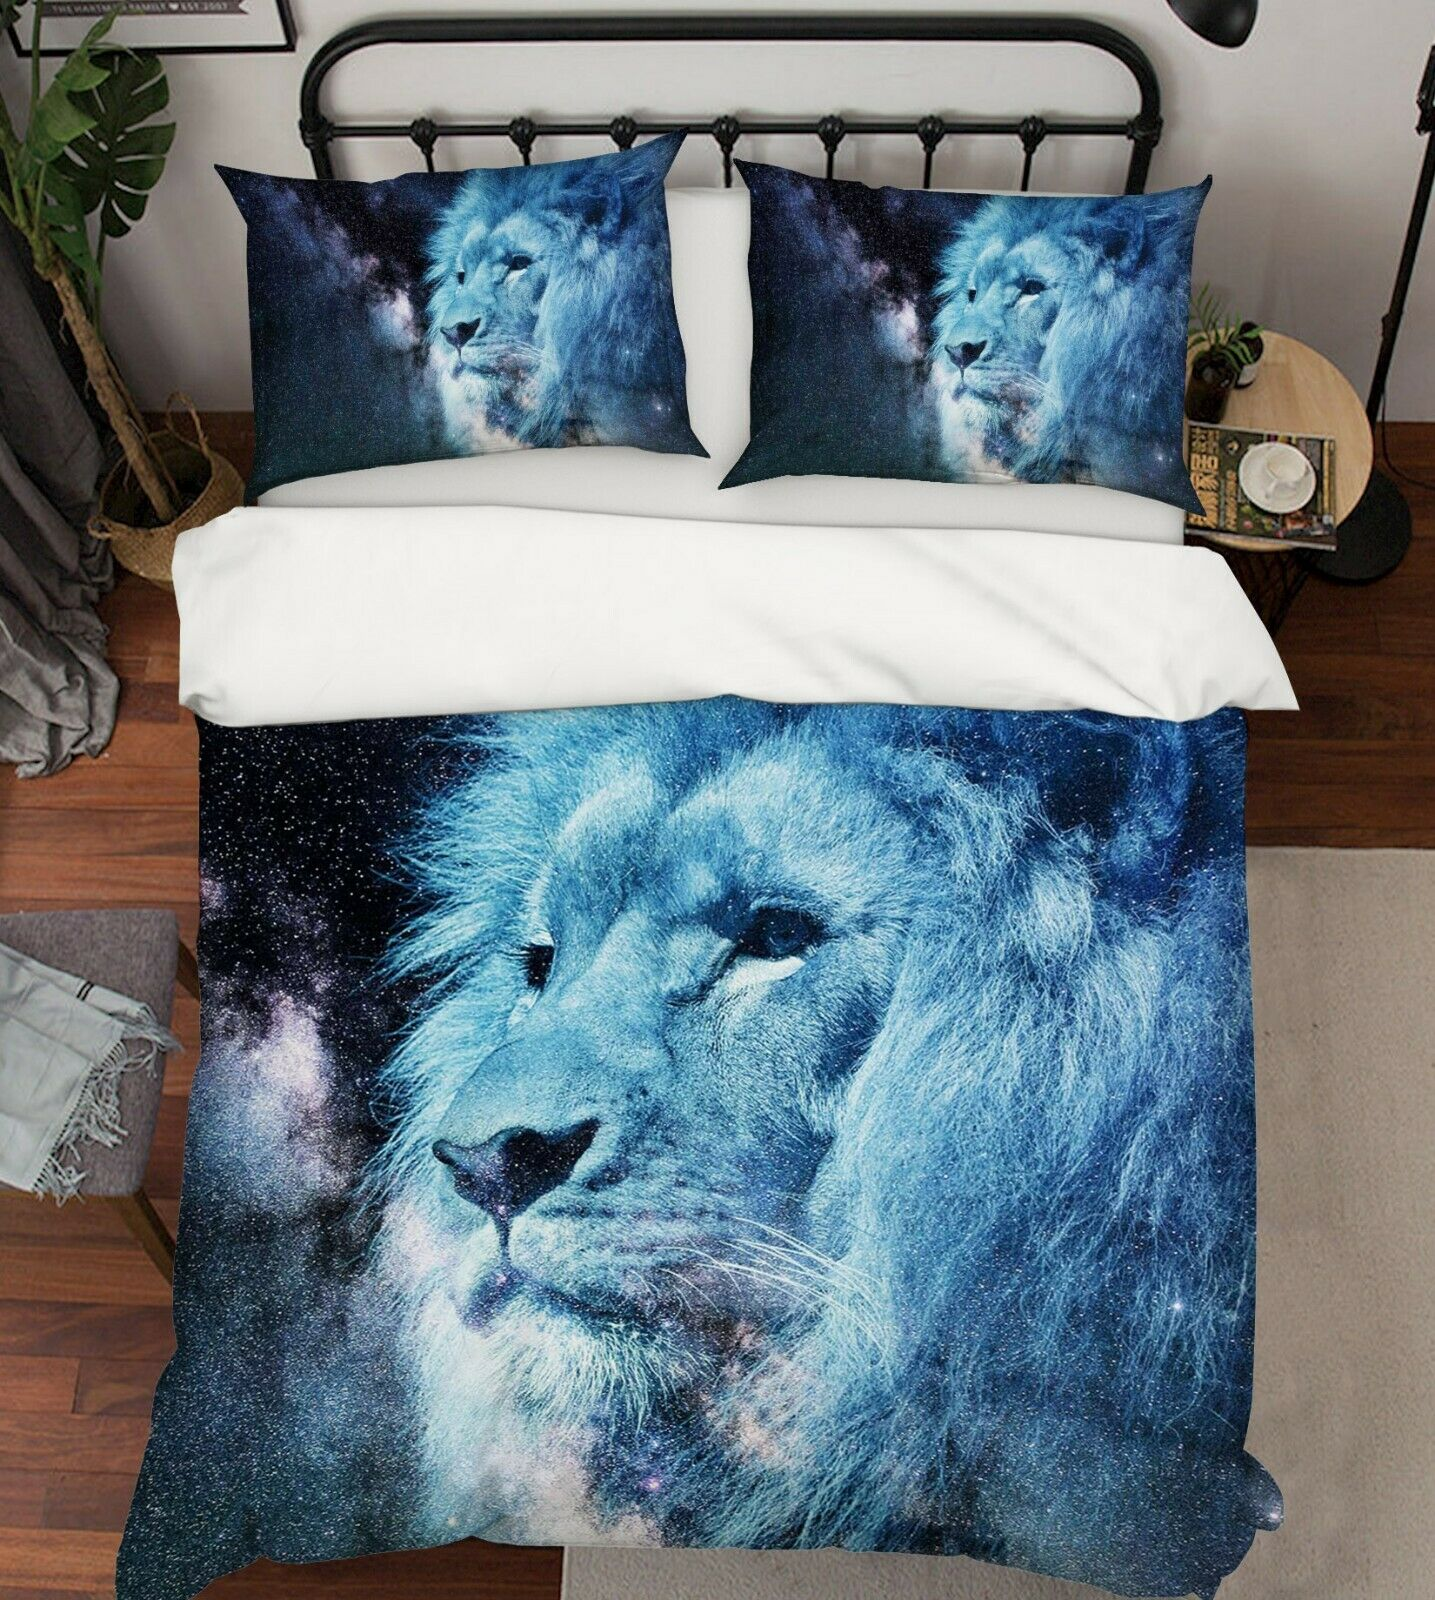 3D Lion Starry Sky R104 Animal Bed Pillowcases Quilt Duvet Cover Queen King Zoe